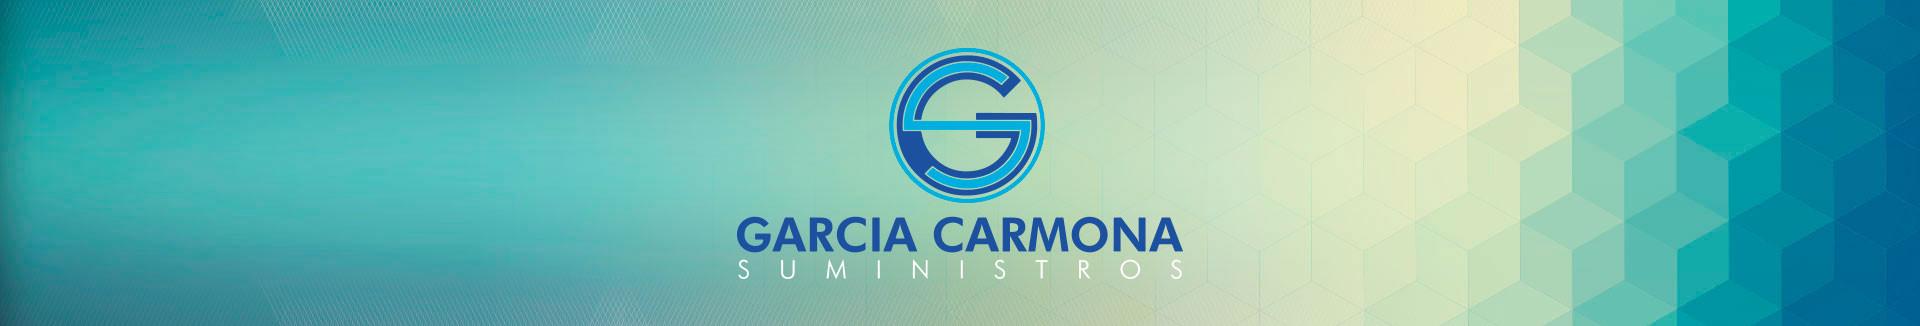 Compra Tu Caldera - García Carmona